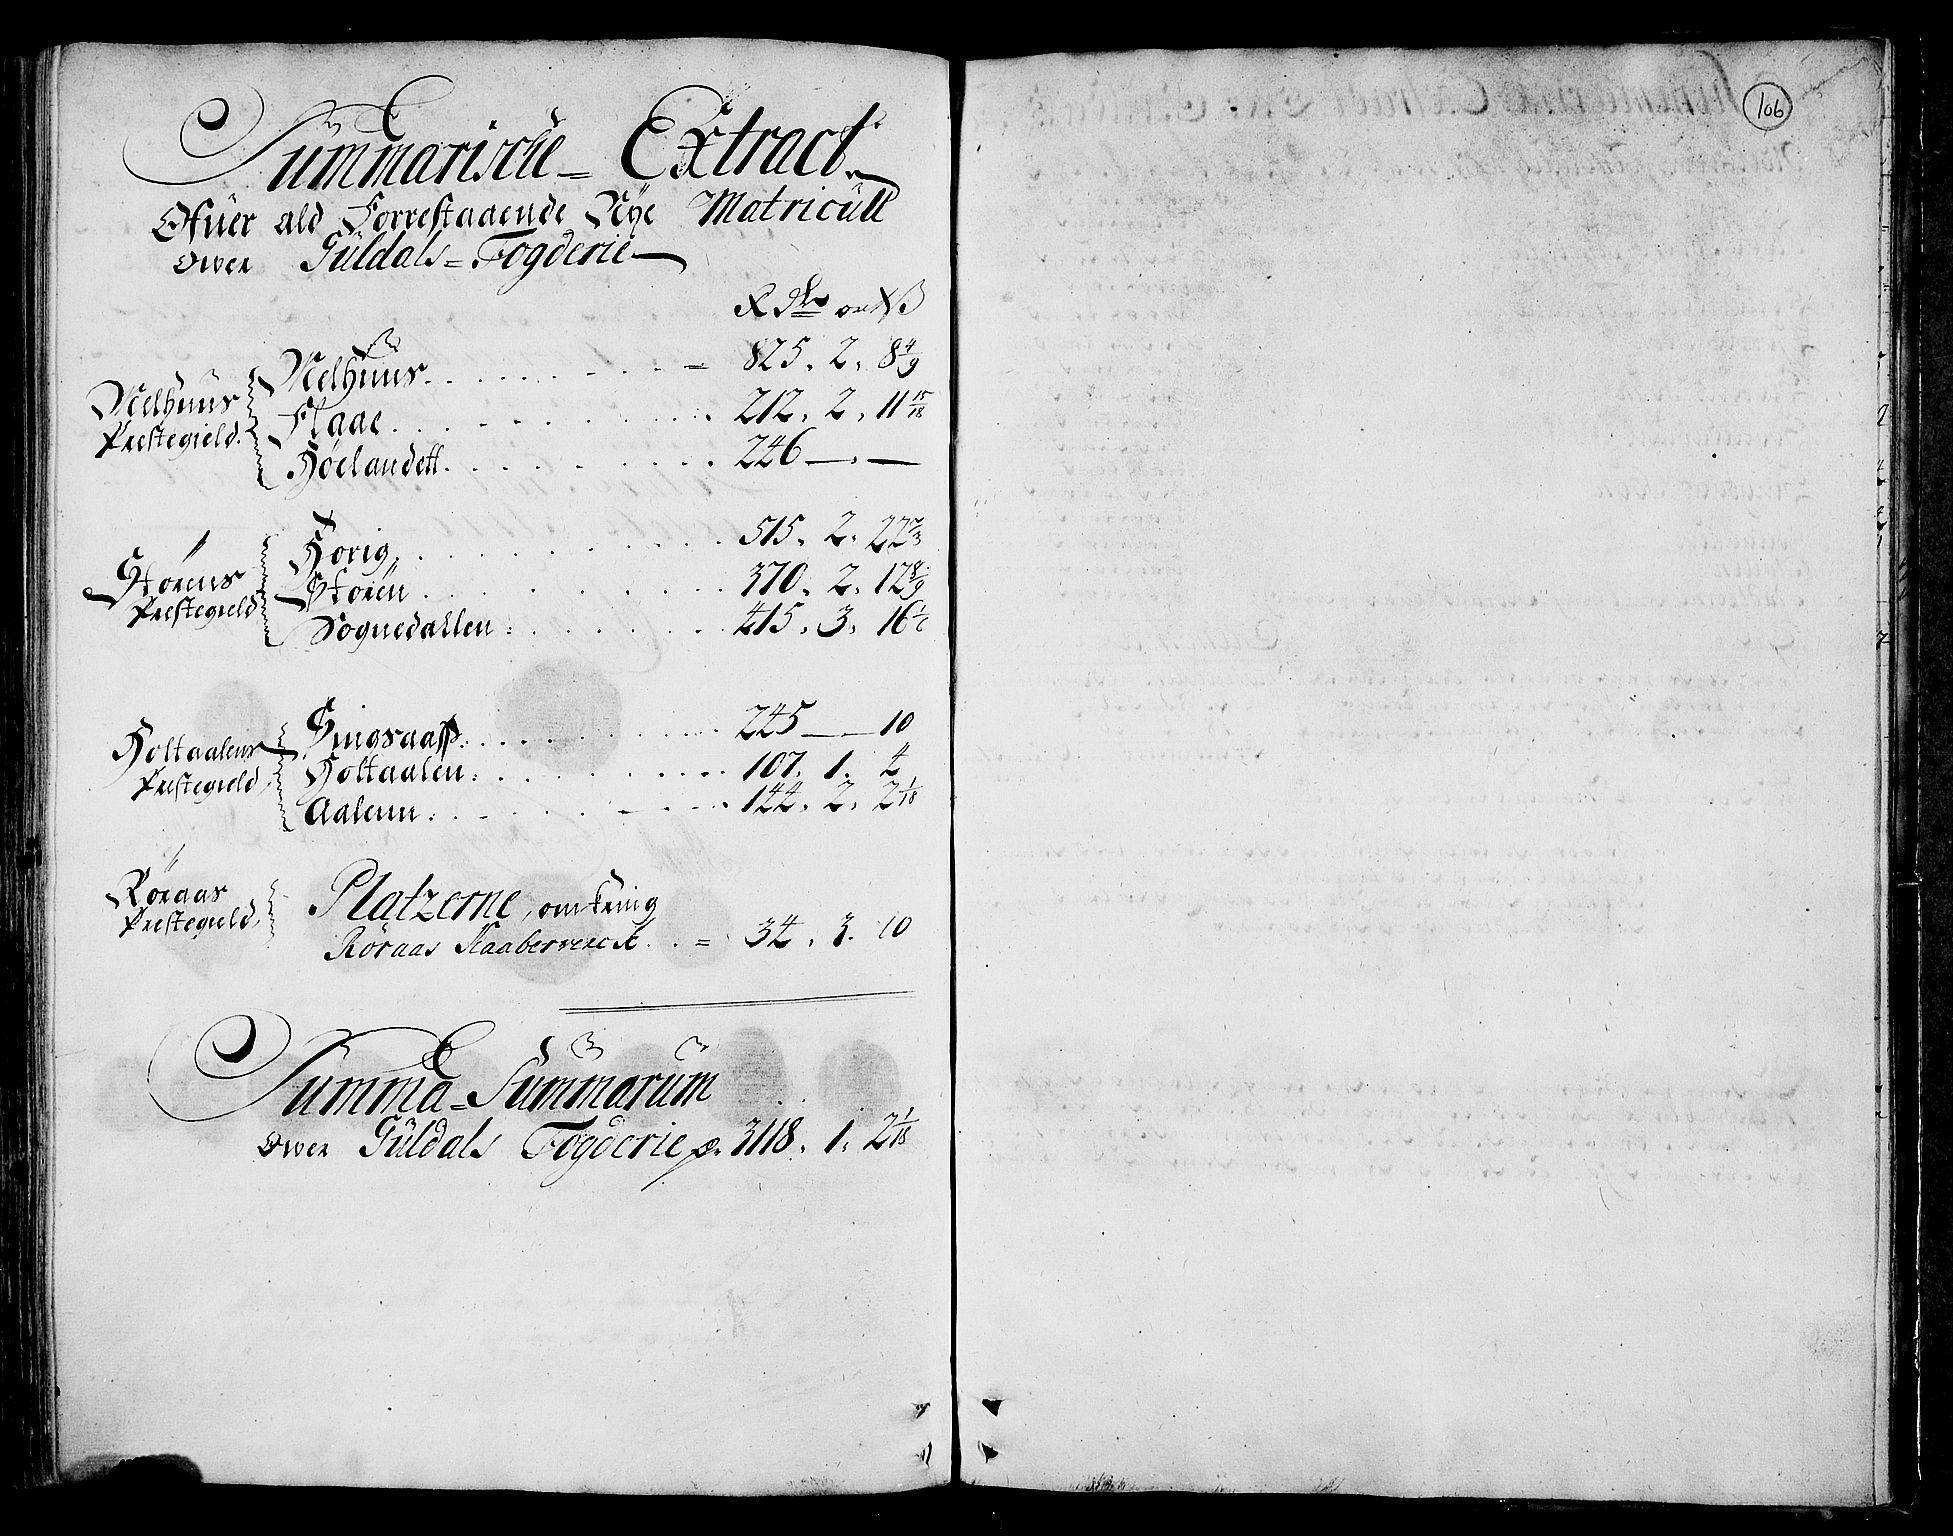 RA, Rentekammeret inntil 1814, Realistisk ordnet avdeling, N/Nb/Nbf/L0159: Gauldal matrikkelprotokoll, 1723, s. 105b-106a